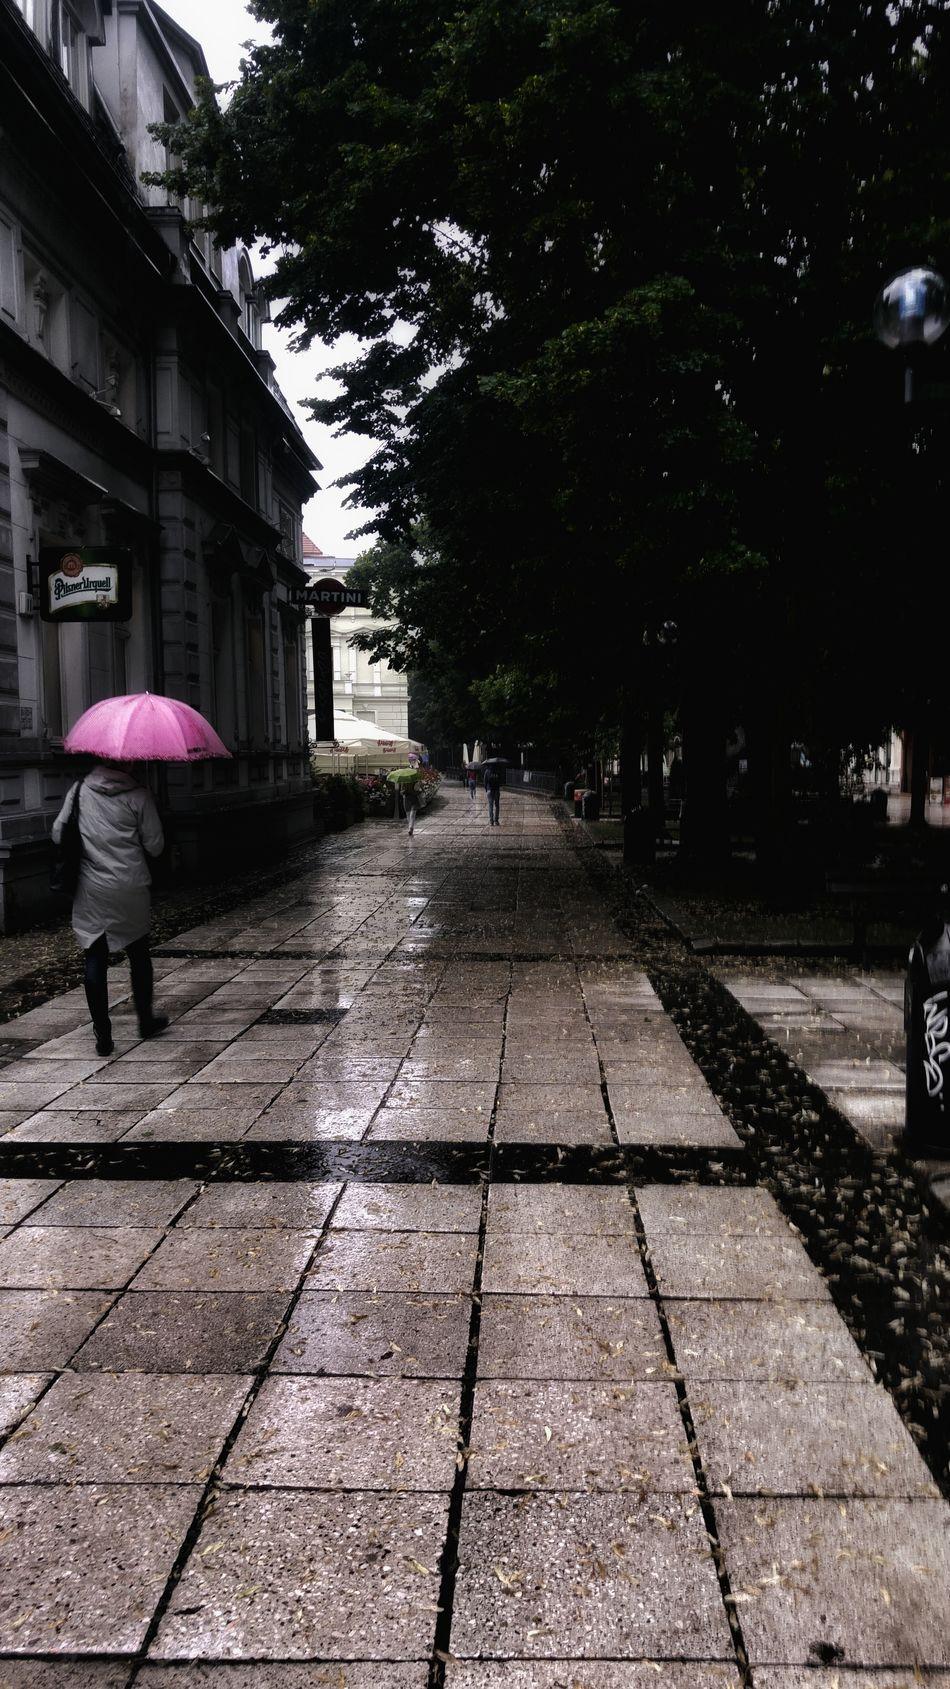 Rainy Day Deszczowy Dzień Stare Miasto Old Town Spacer Walking On The Rain Parasol Umbrella Pink Umbrella Przechodnie Pedestrians Green Tree Pavement Chodnik Wet Pavement